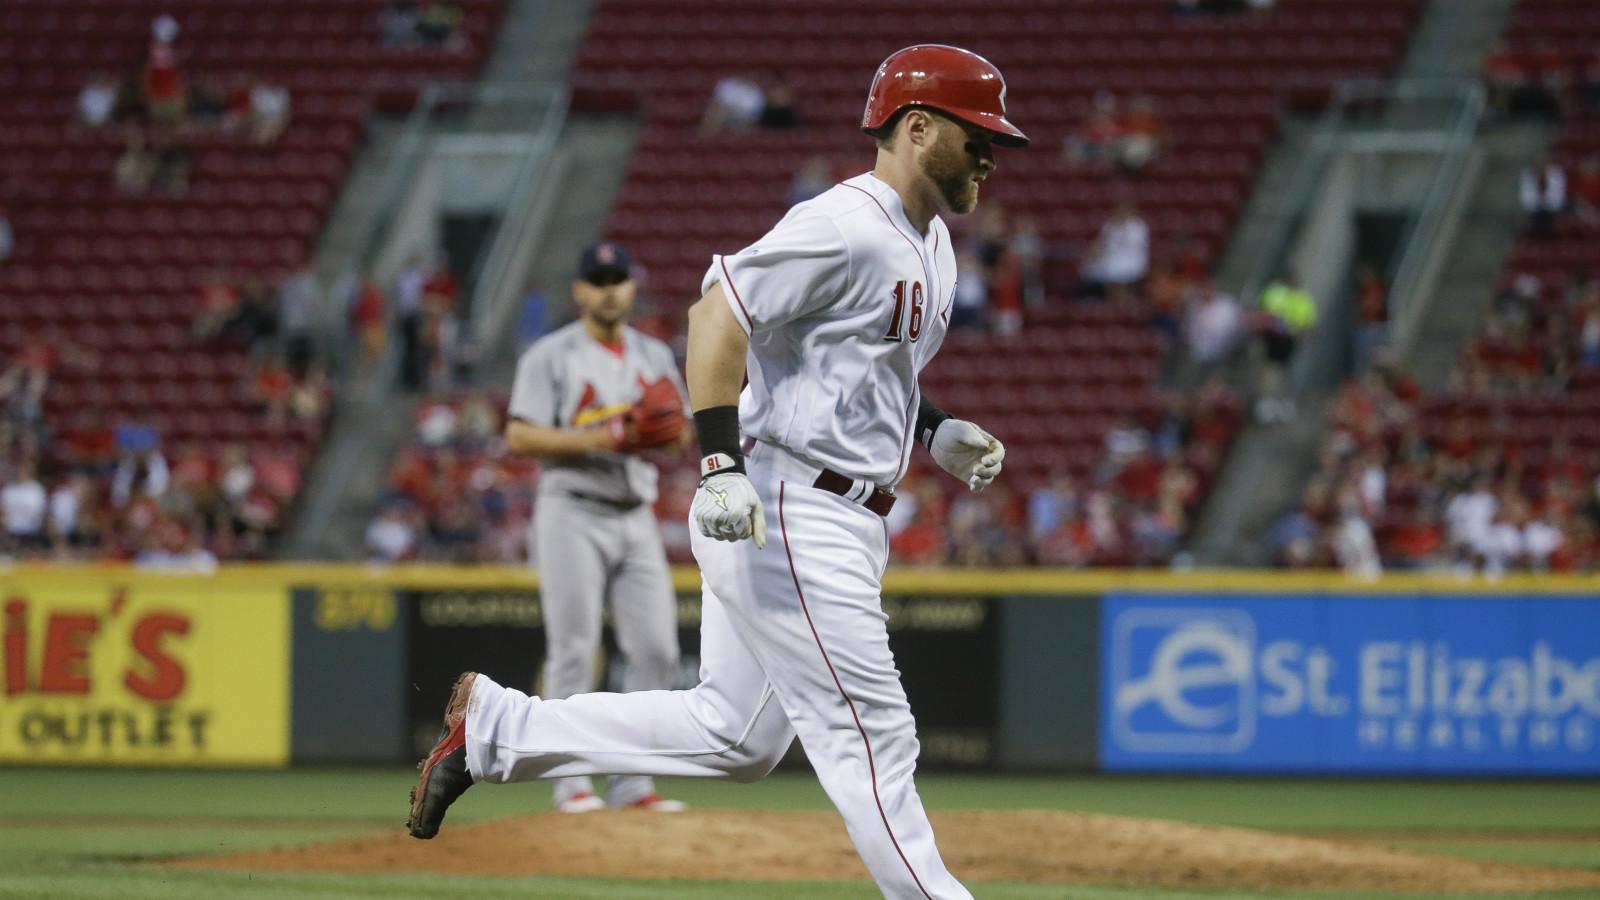 Barnhart, Cozart homer in loss to Cardinals